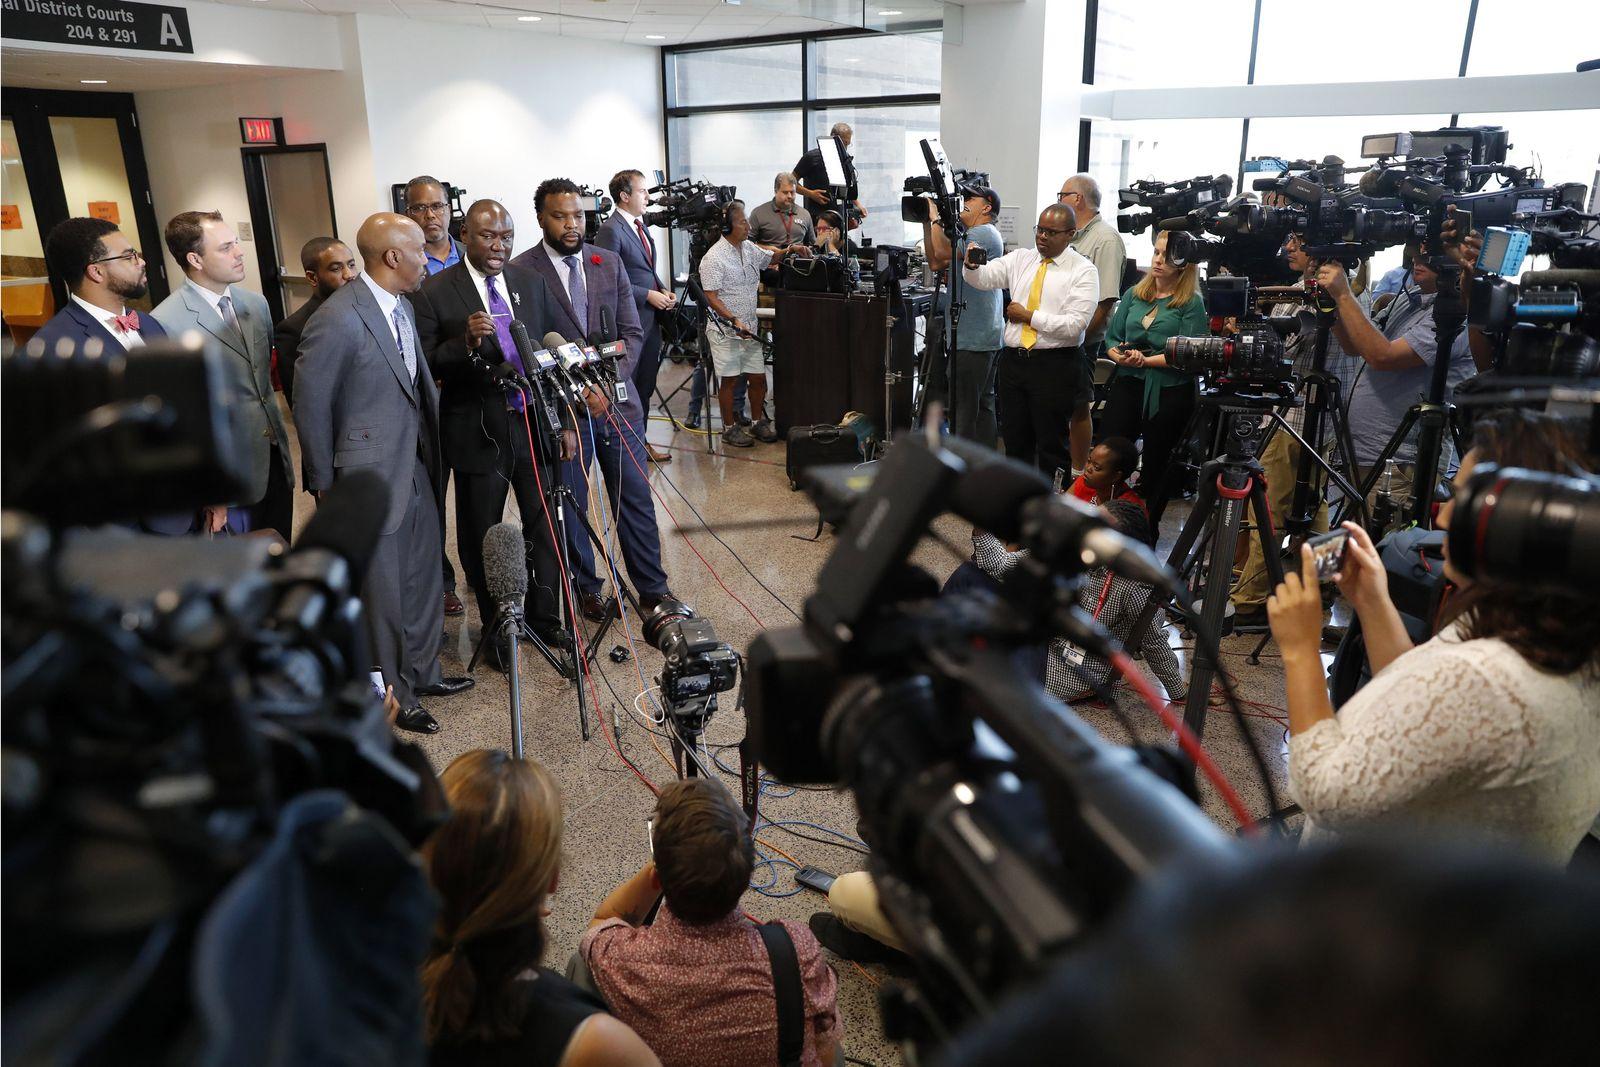 Dallas Officer Mistaken Apartment